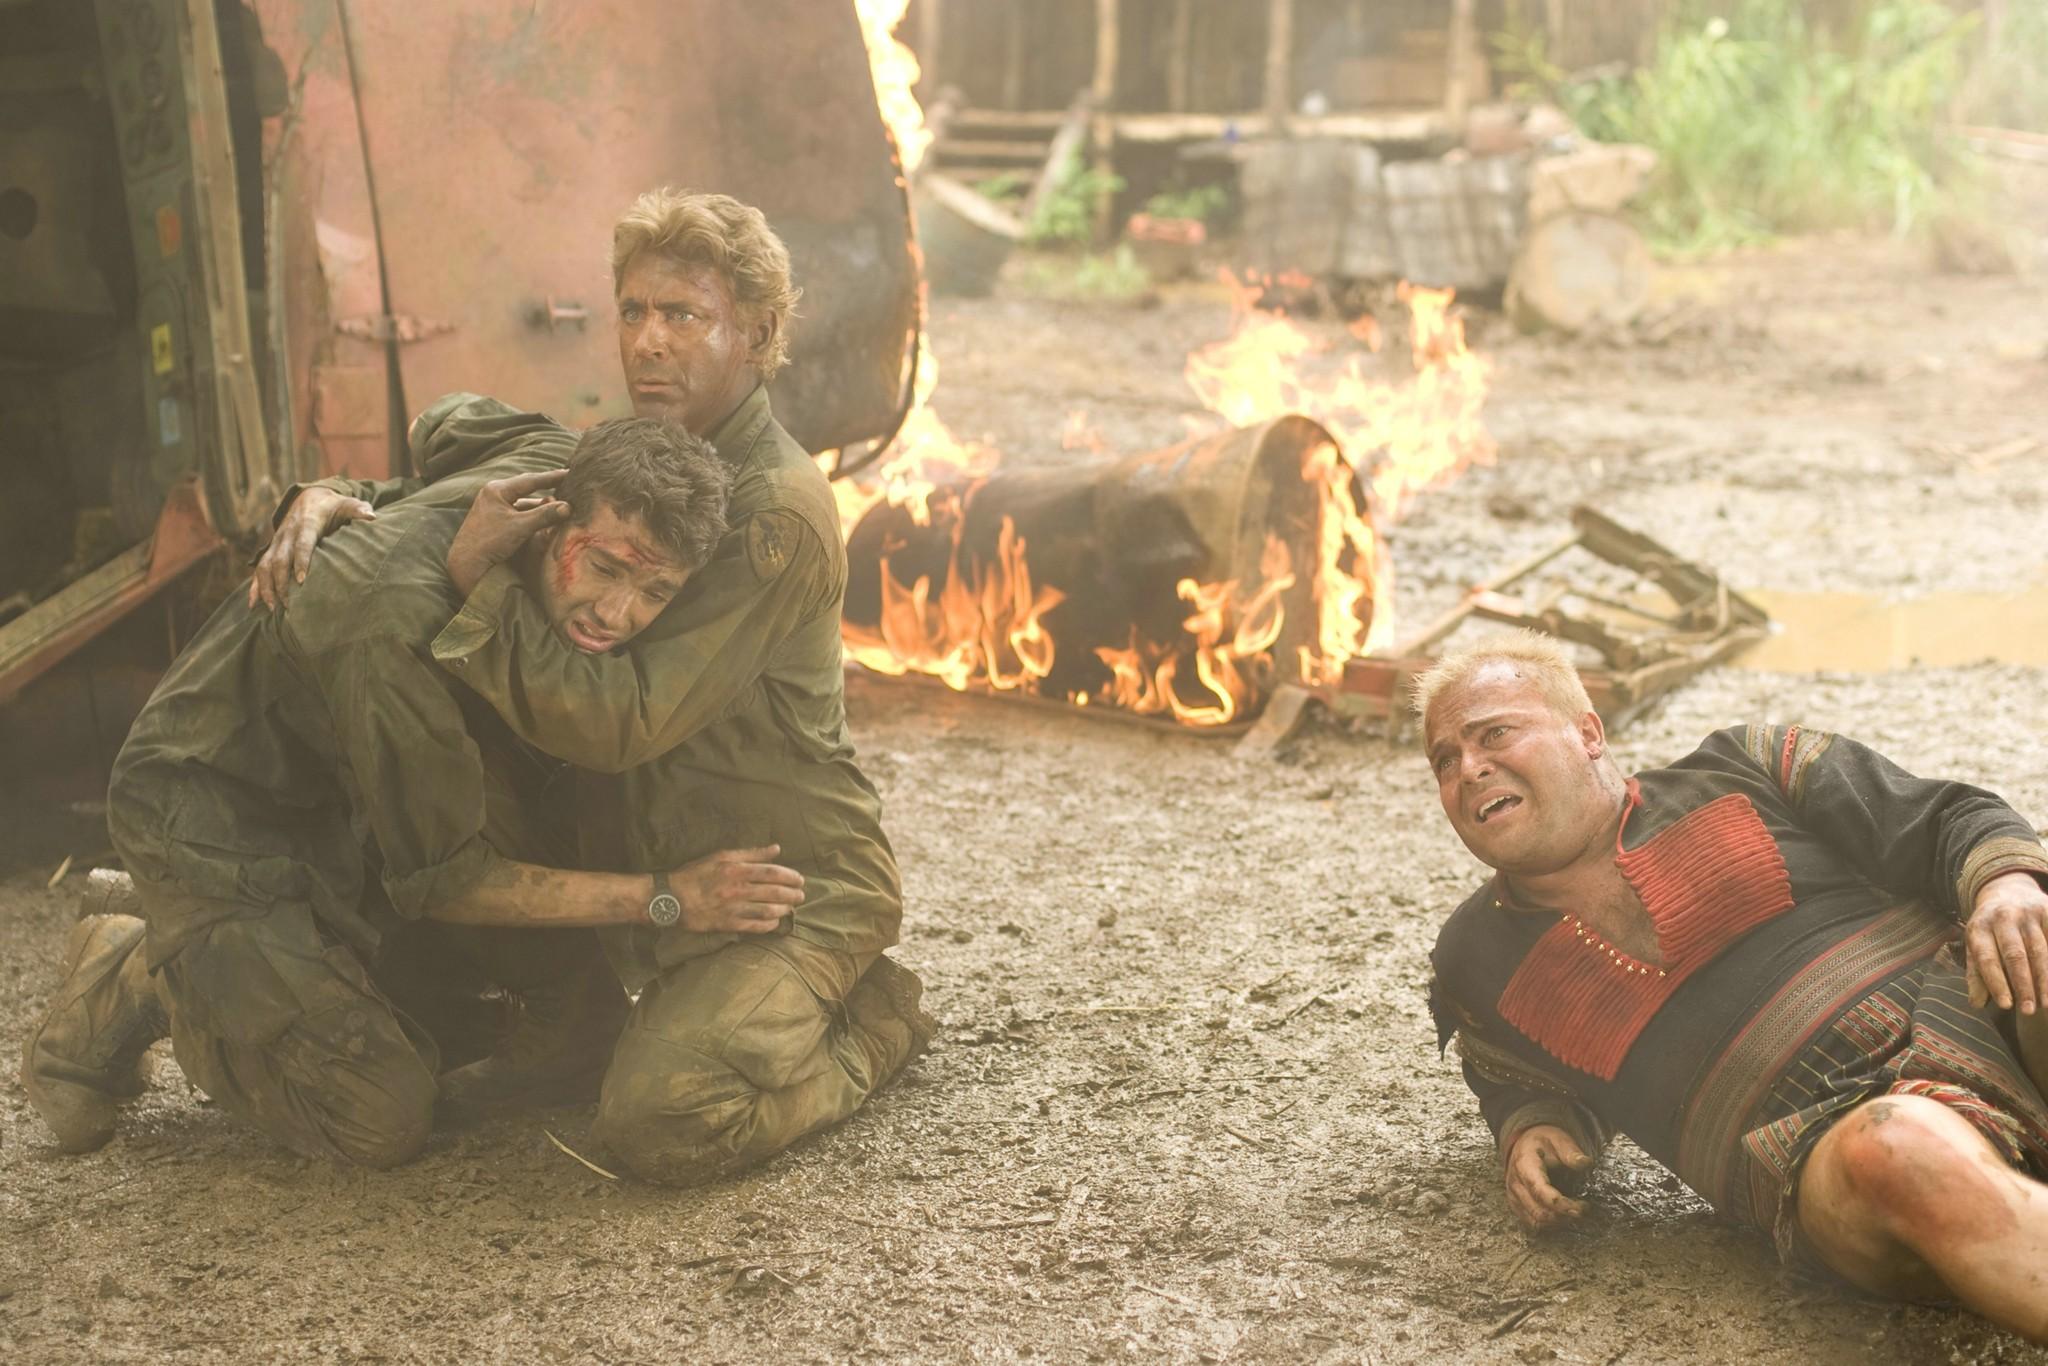 Robert Downey Jr., Jay Baruchel, and Jack Black in Tropic Thunder (2008)